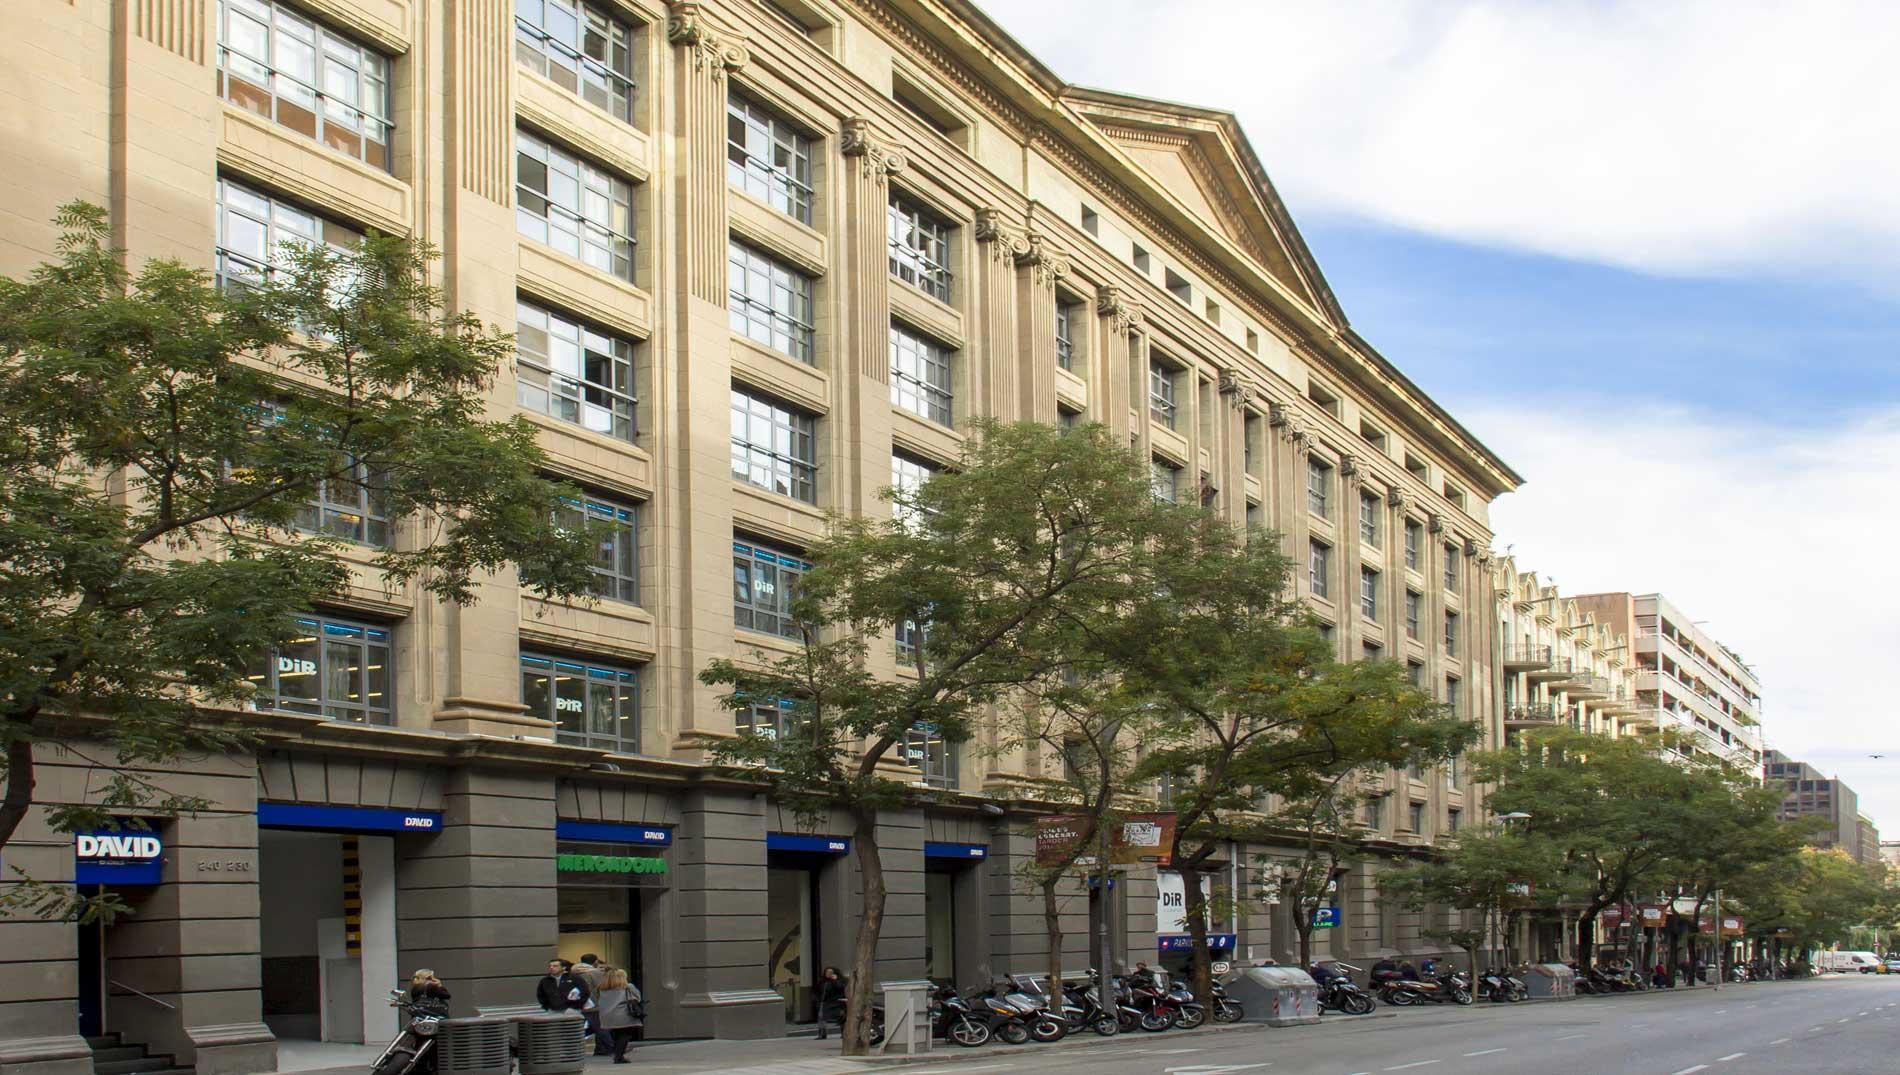 curso dialux, curso dialux barcelona - mexico, dialux, calculo luminico, Avanluce, Edificio David, Barcelona